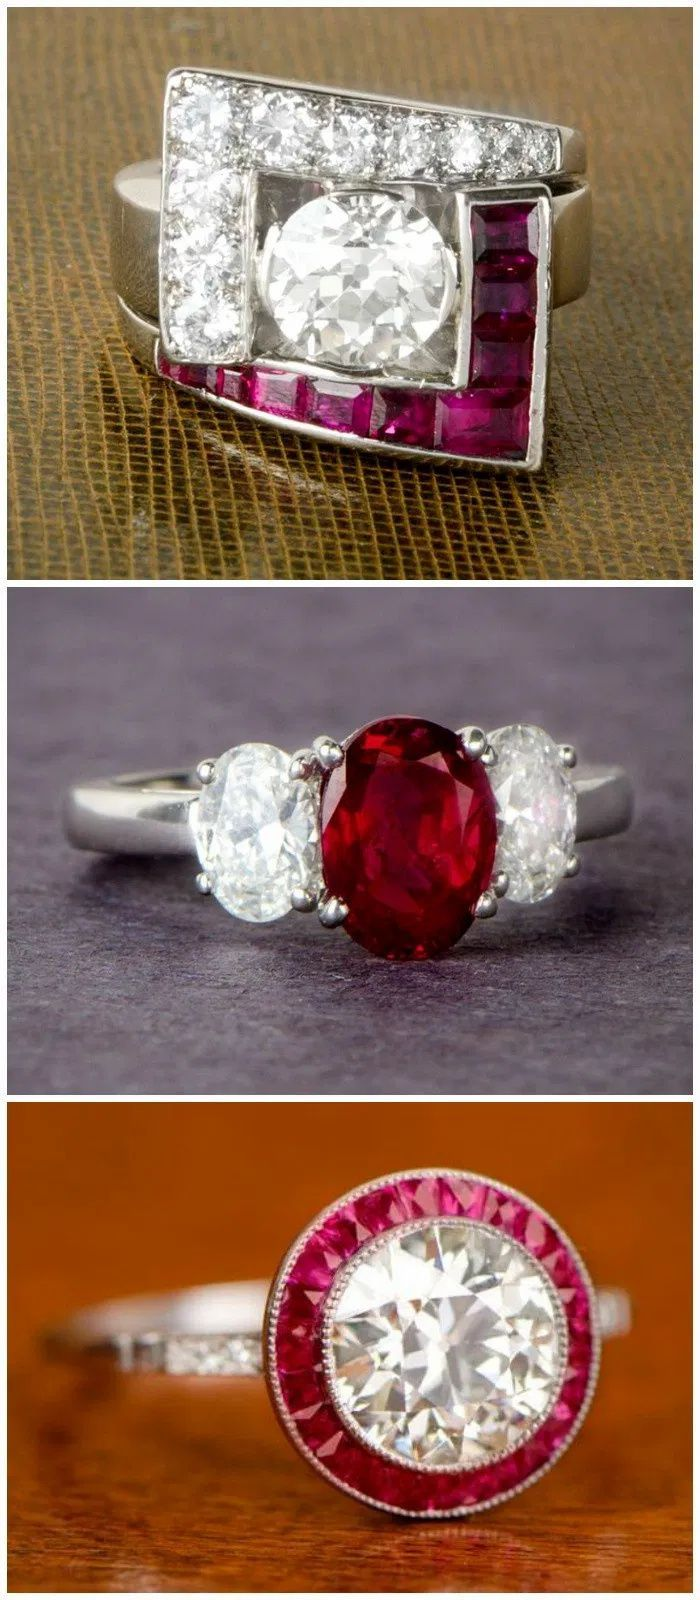 Three beautiful rings with rubies from Estate Diamond Jewelry.